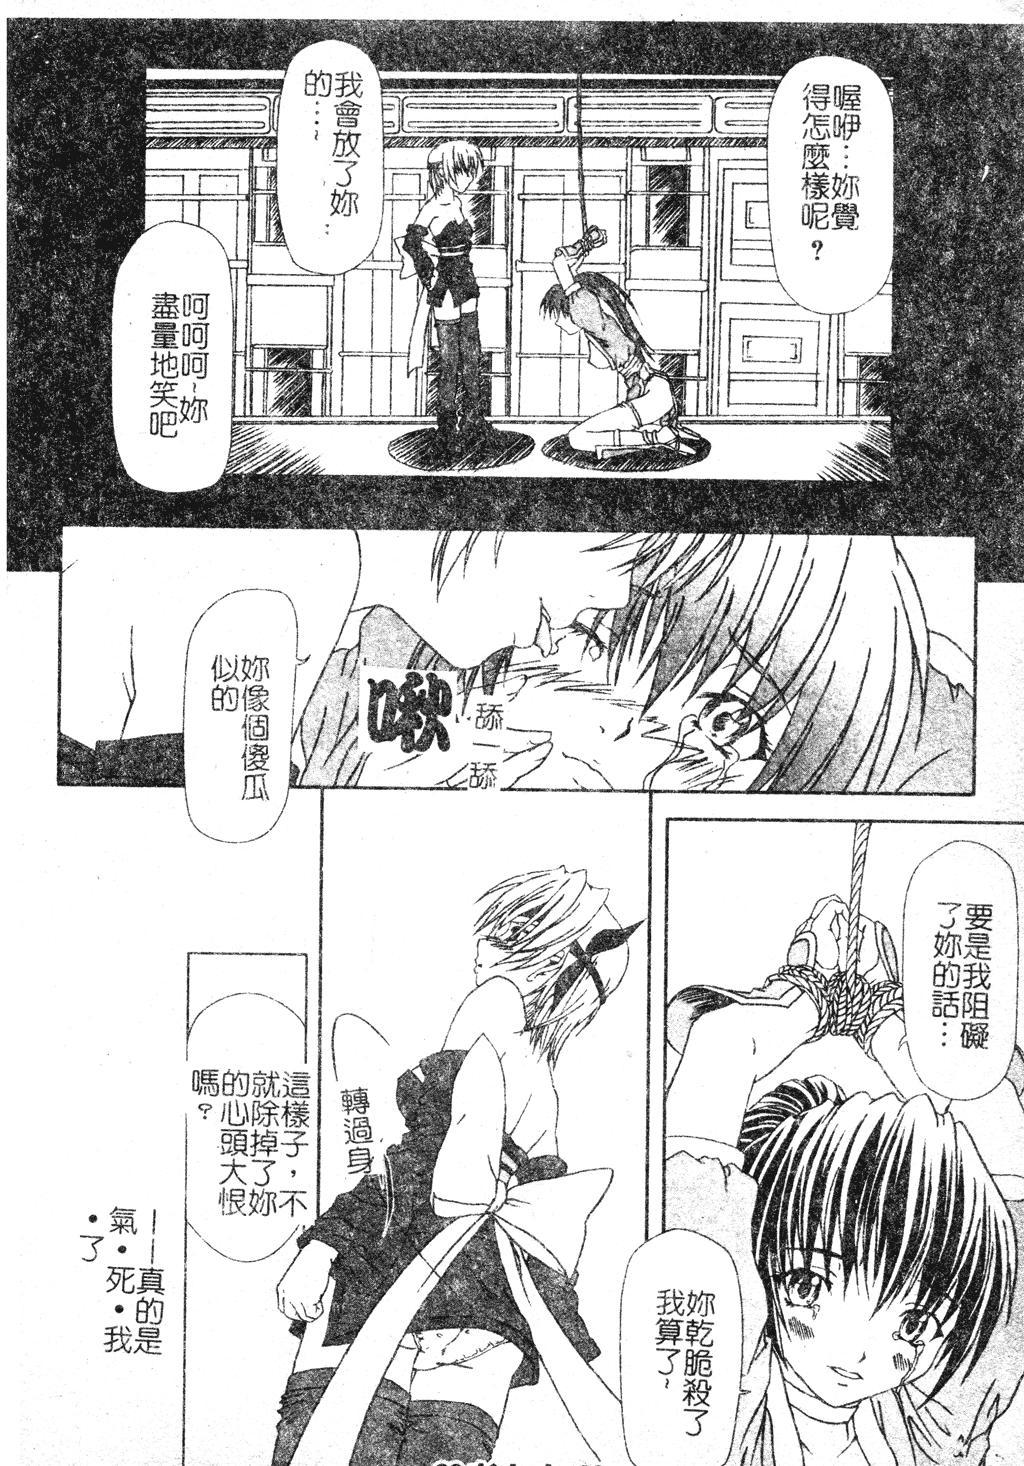 DenNow Koihime Collection 7 26